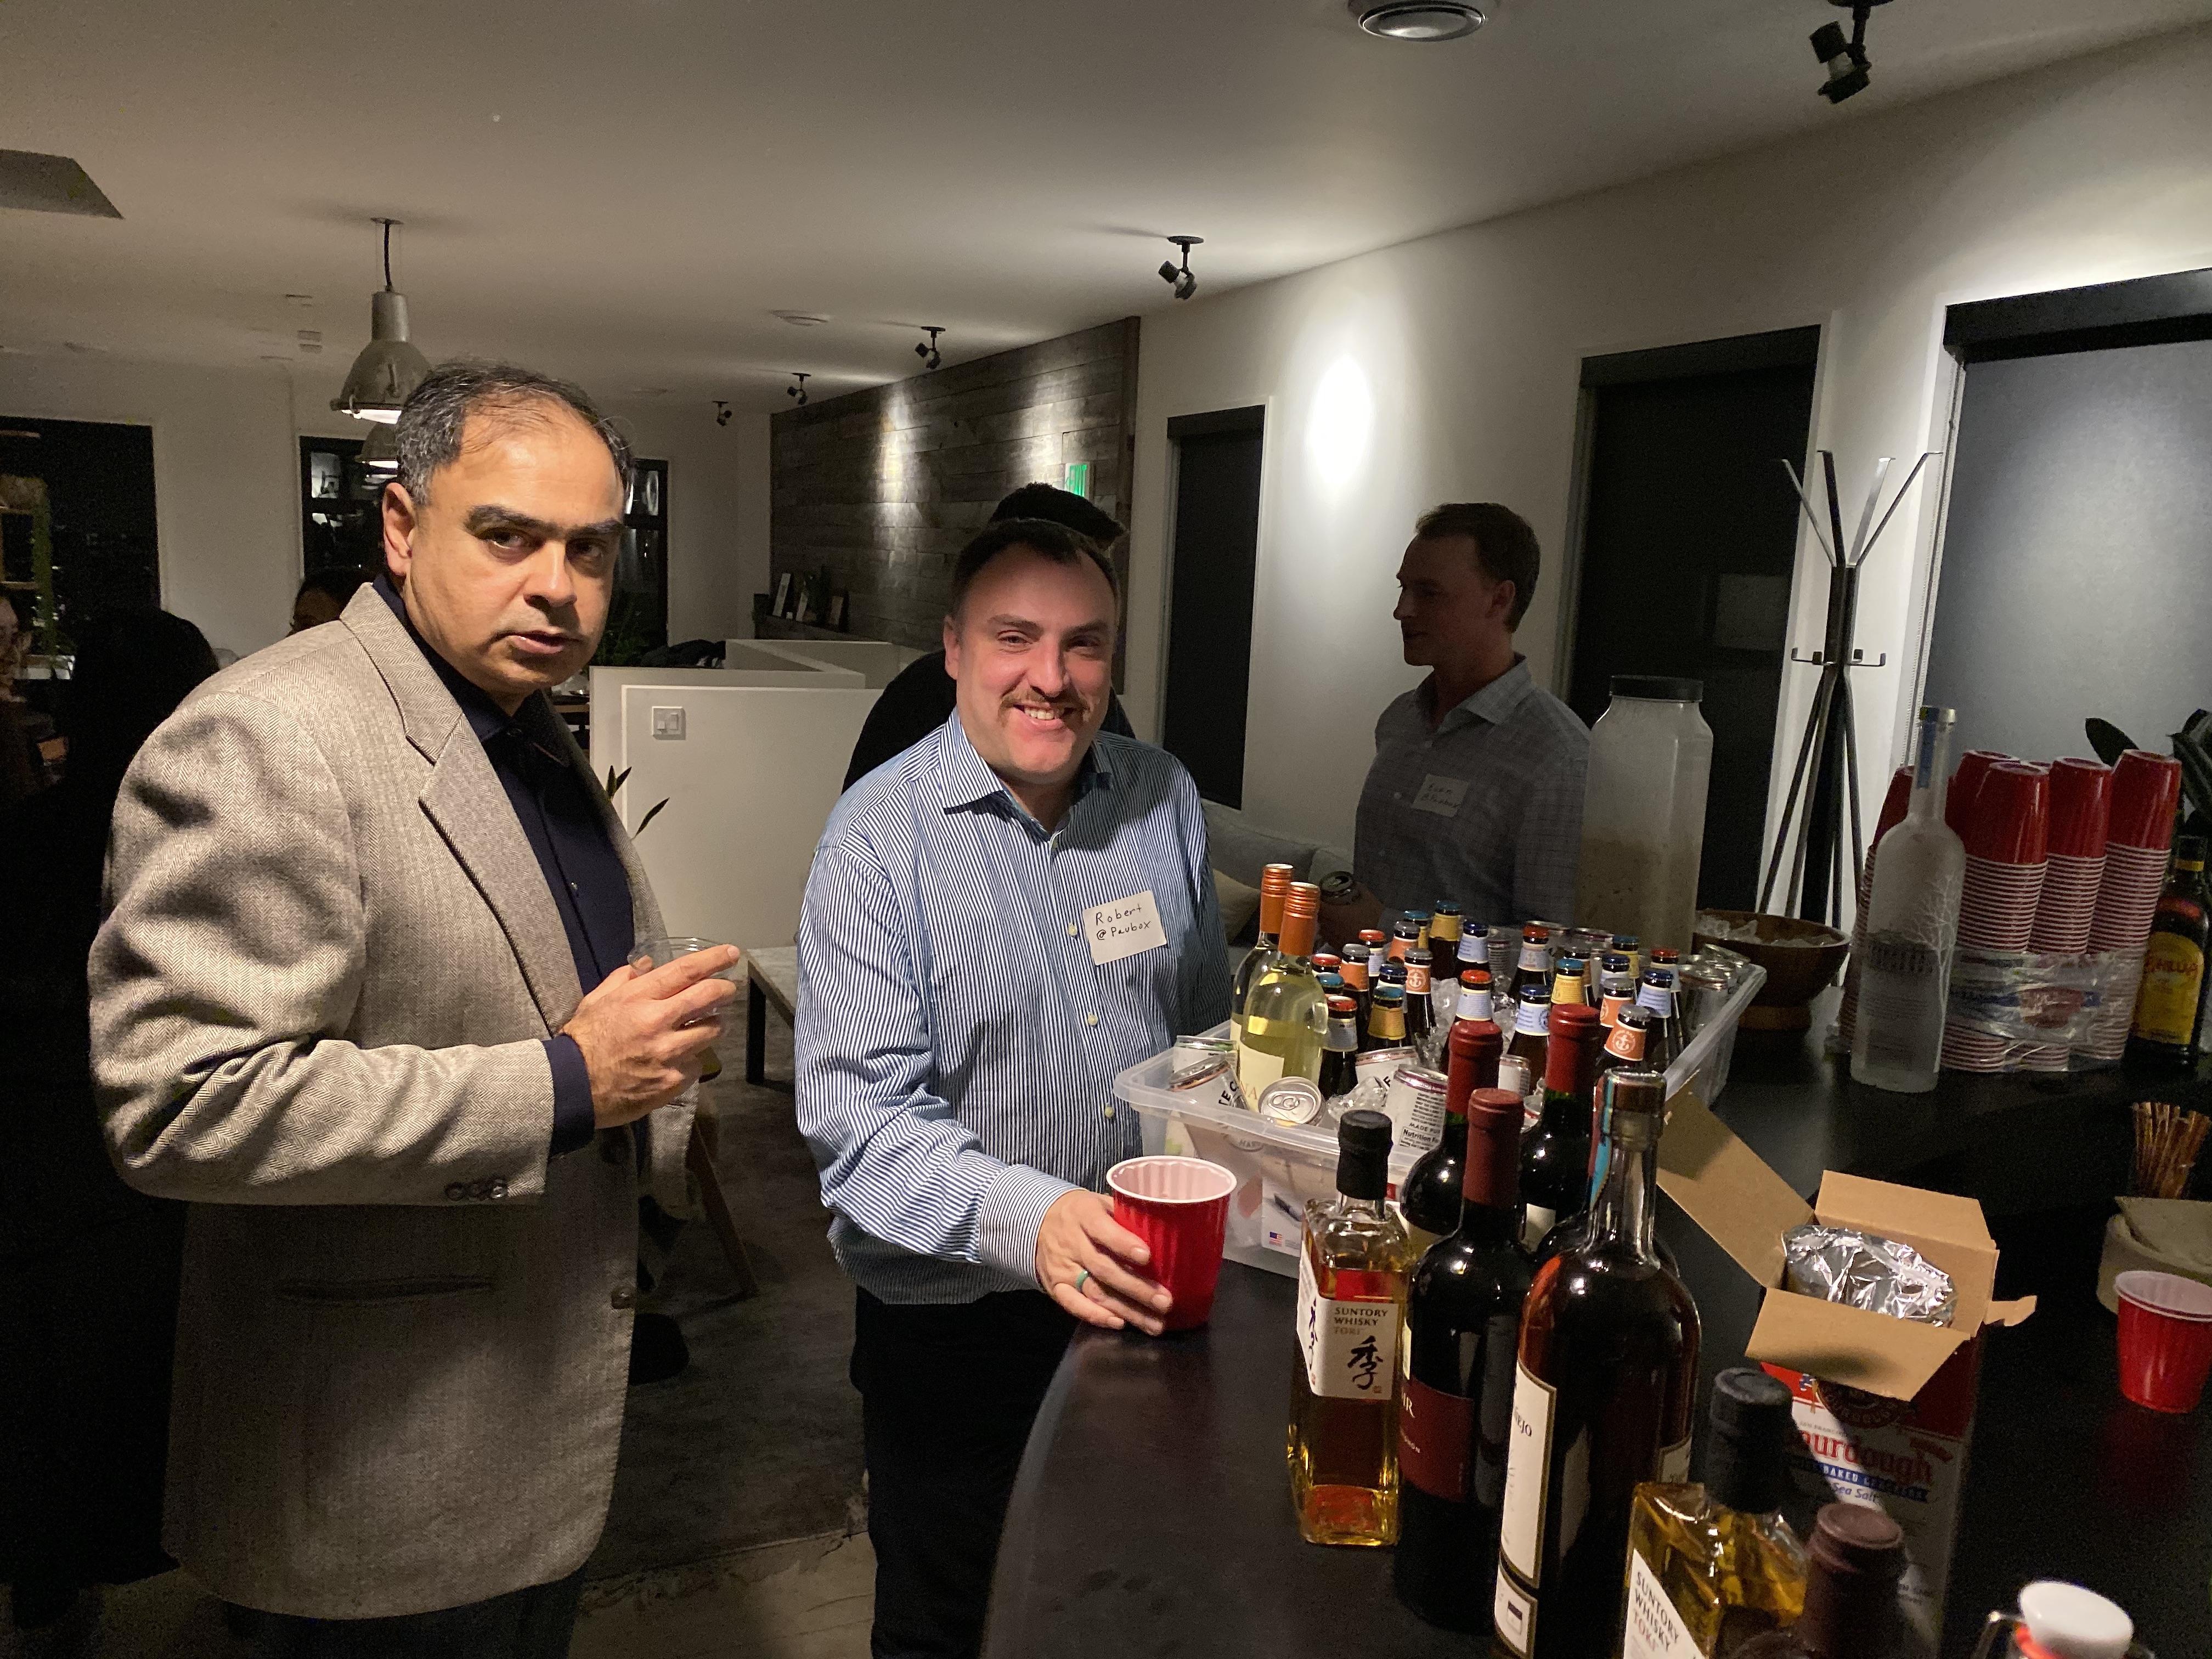 Paubox + Zentist 2020 Social Mixer (pics): Kamal Anand & Robert Ogus